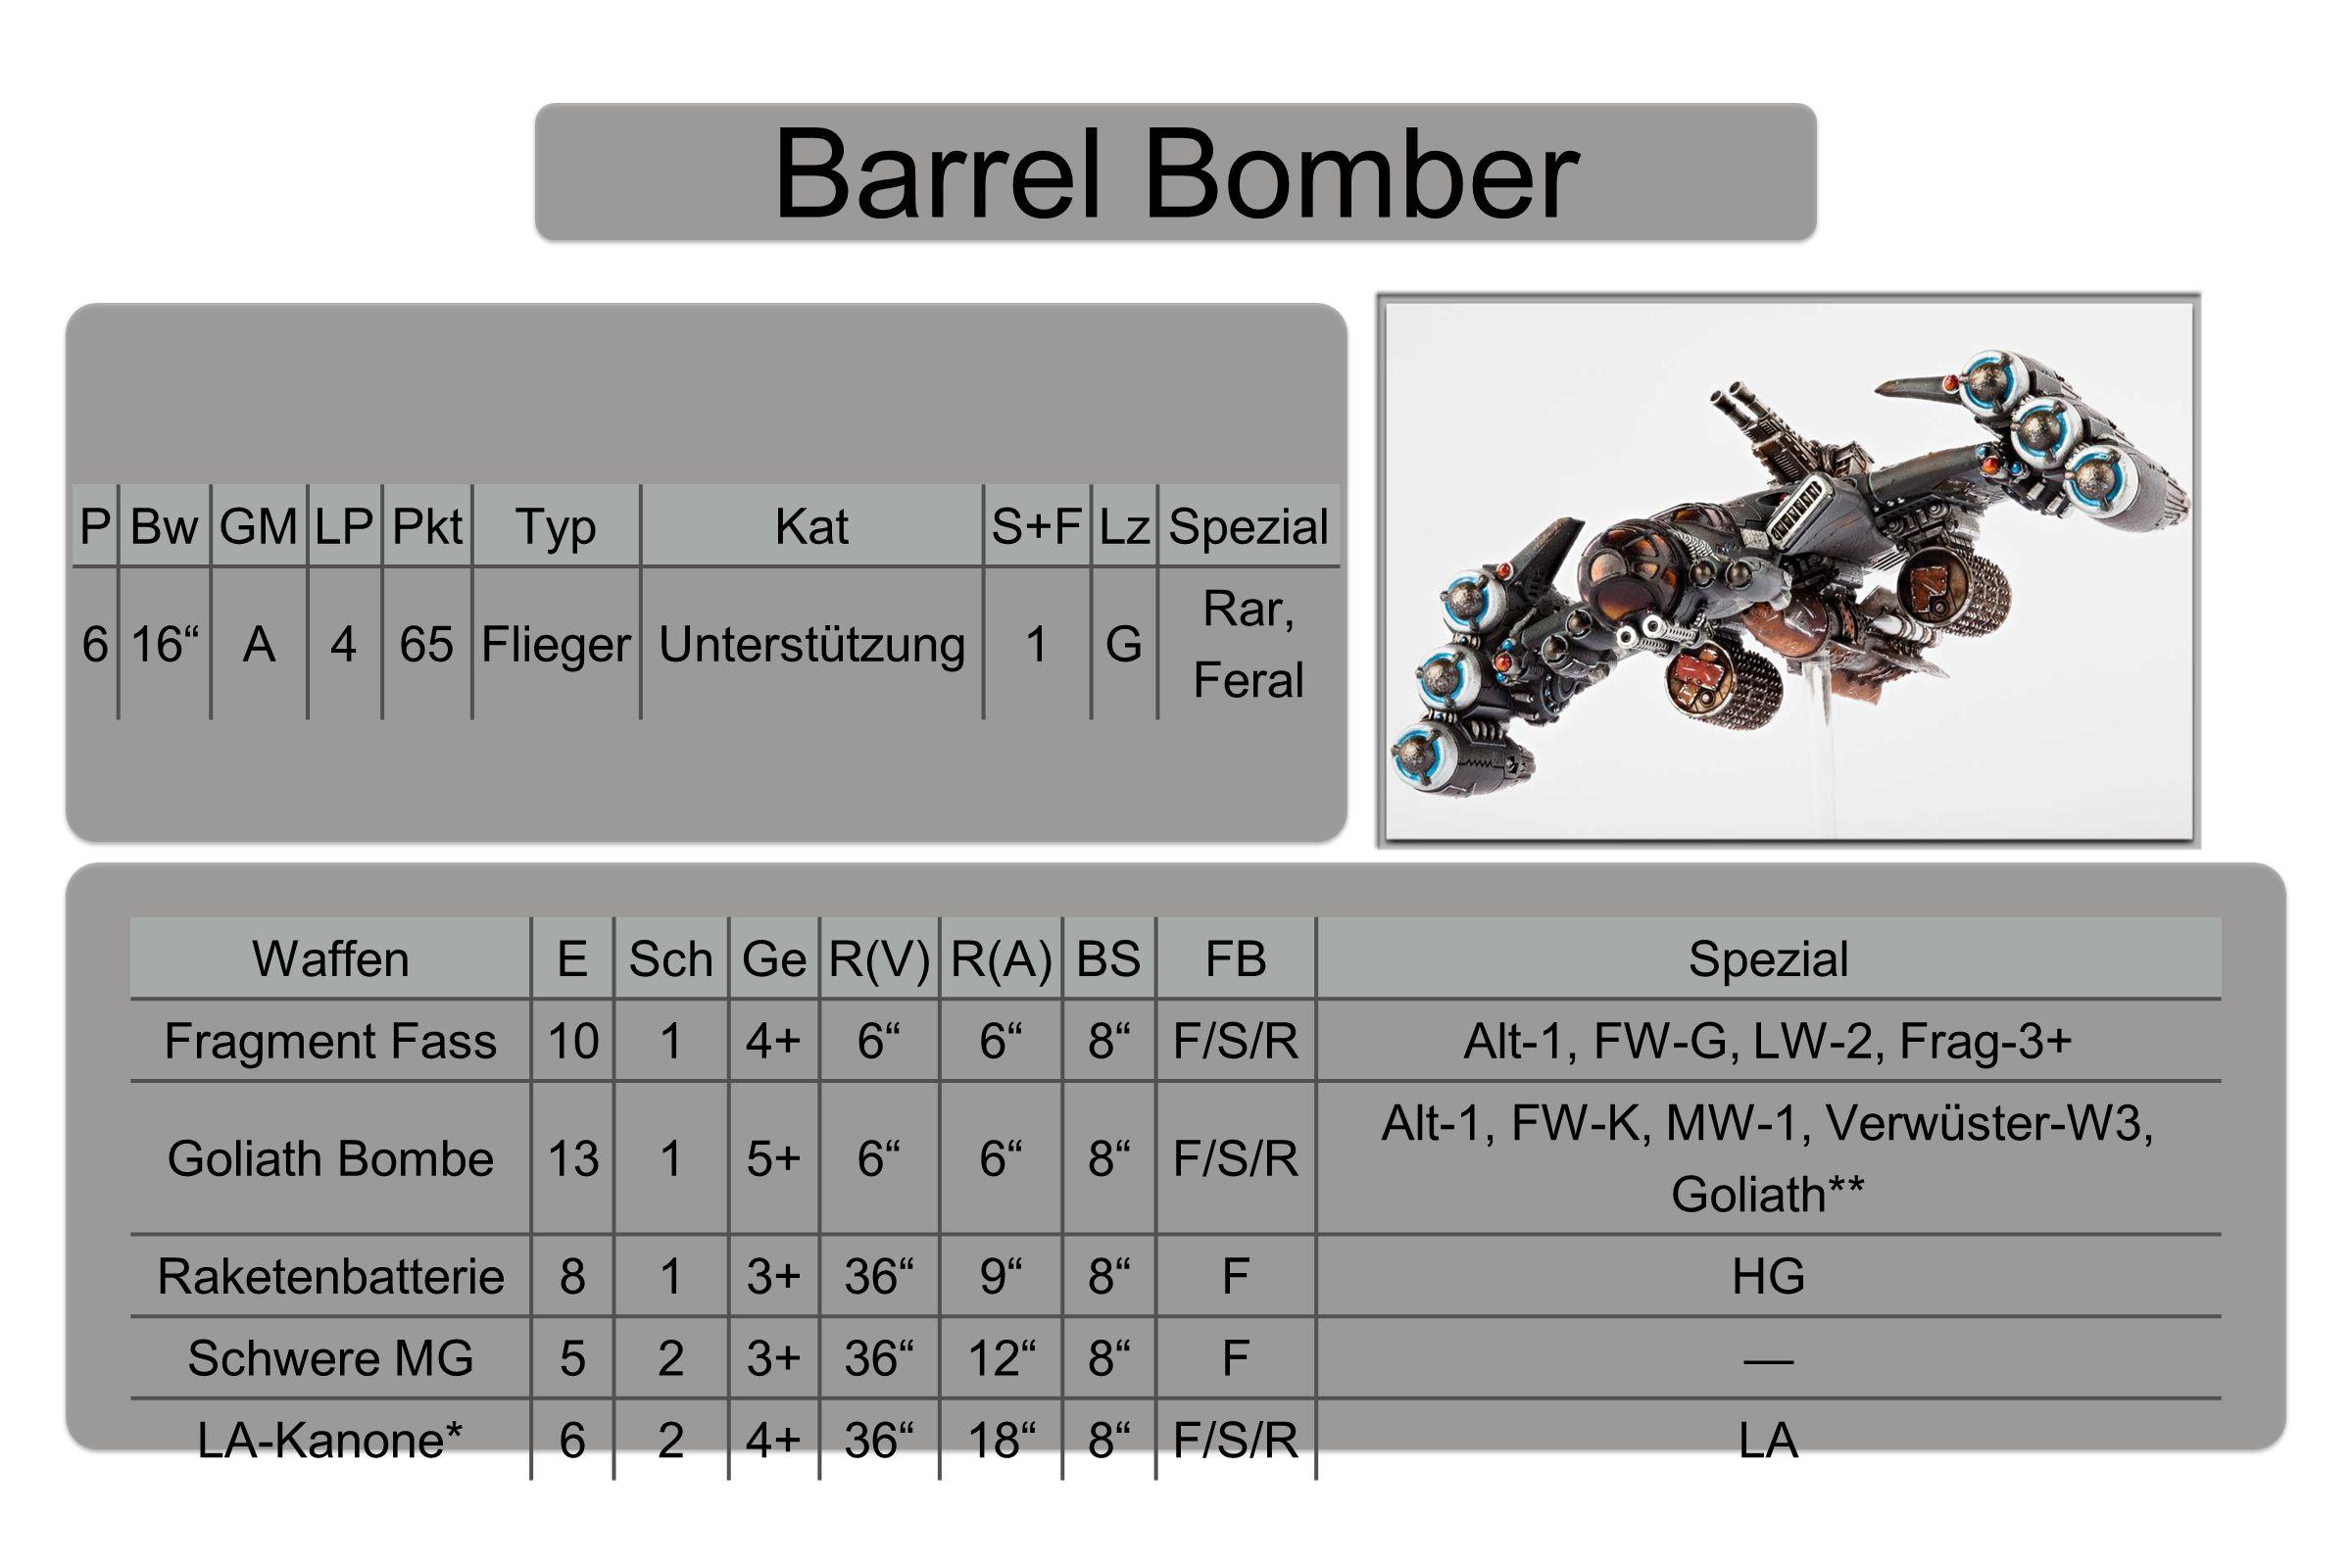 Barrel Bomber WaffenESchGeR(V)R(A)BSFBSpezial Fragment Fass1014+6 8 F/S/RAlt-1, FW-G, LW-2, Frag-3+ Goliath Bombe1315+6 8 F/S/R Alt-1, FW-K, MW-1, Verwüster-W3, Goliath** Raketenbatterie813+36 9 8 FHG Schwere MG523+36 12 8 F— LA-Kanone*624+36 18 8 F/S/RLA PBwGMLPPktTypKatS+FLzSpezial 616 A465FliegerUnterstützung1G Rar, Feral